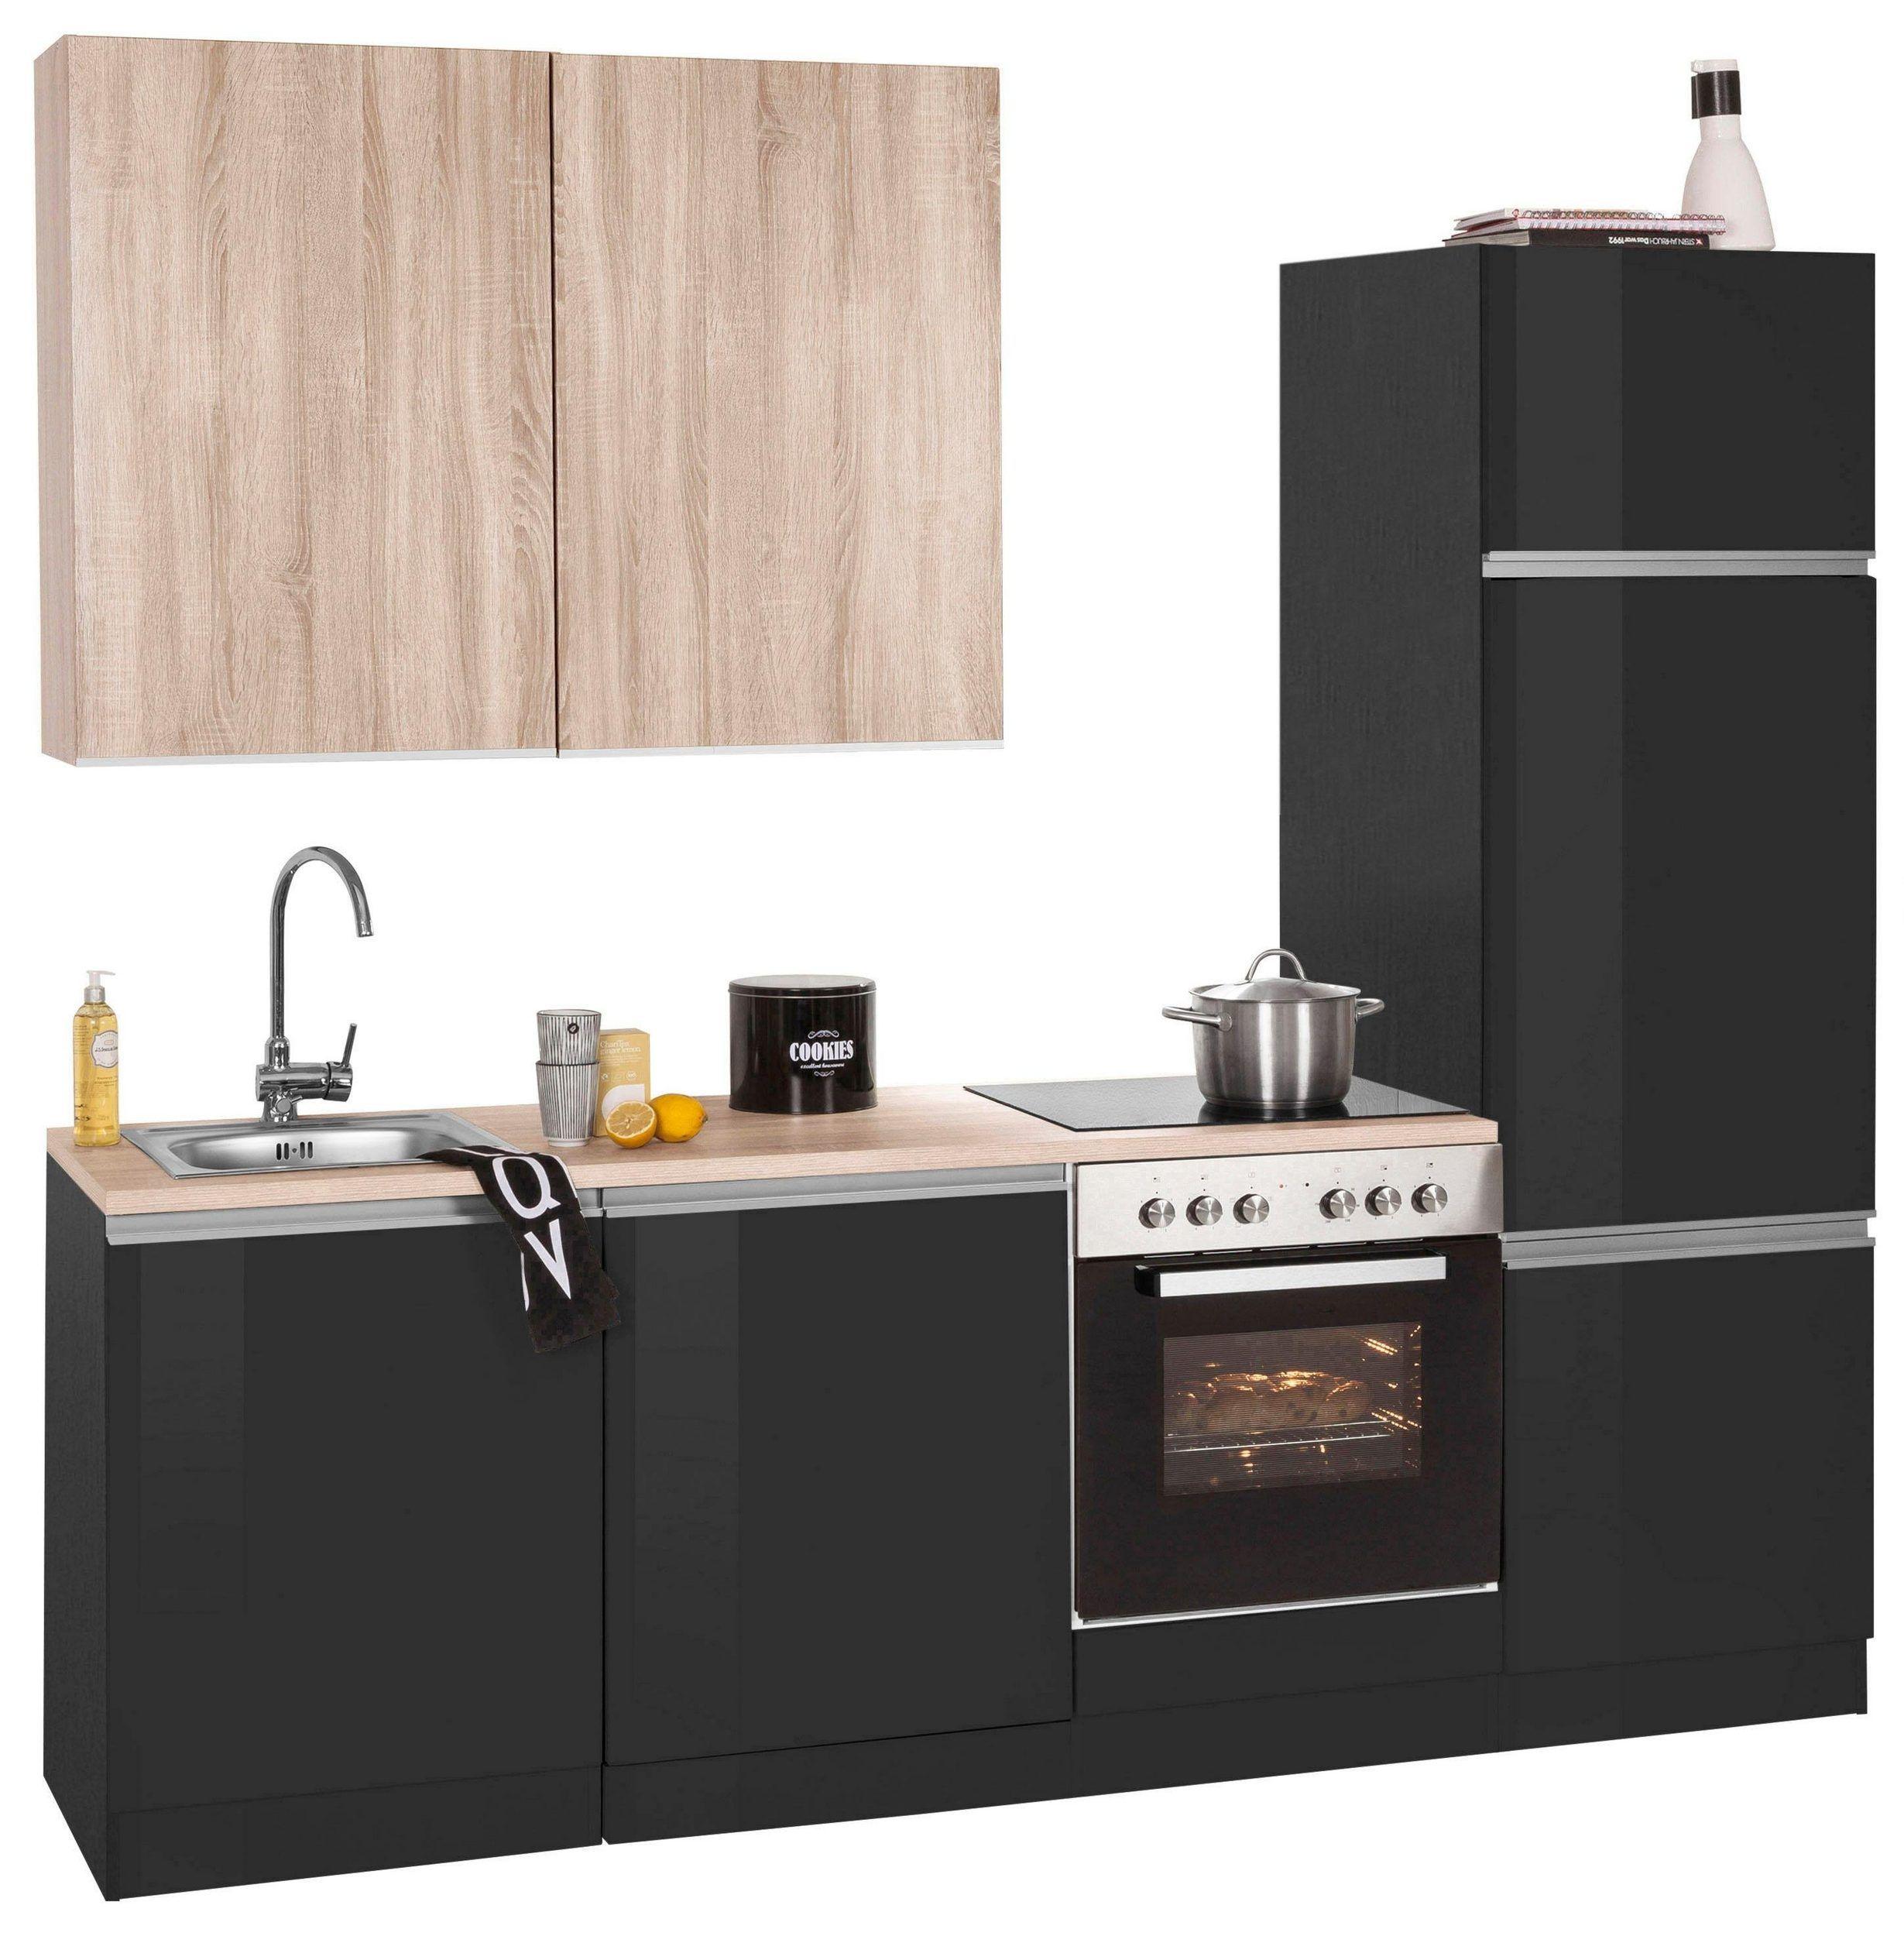 Held Mobel Held Kitchen Cabinets Kitchenette Furniture Kitchen Cabinets